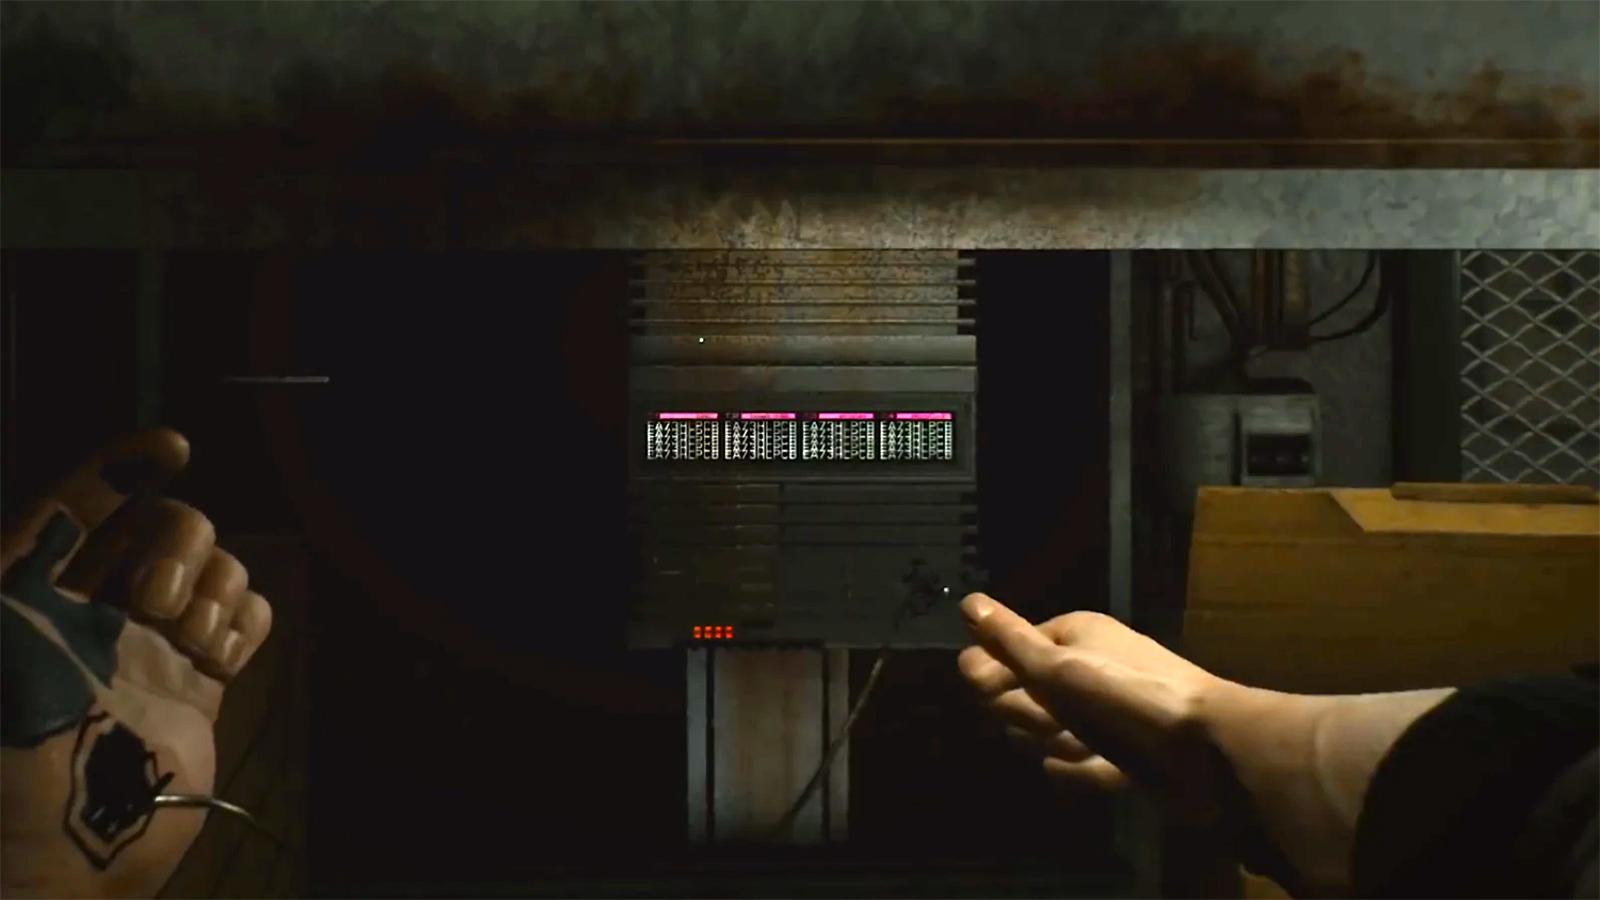 Cyberpunk 2077 hacking access point